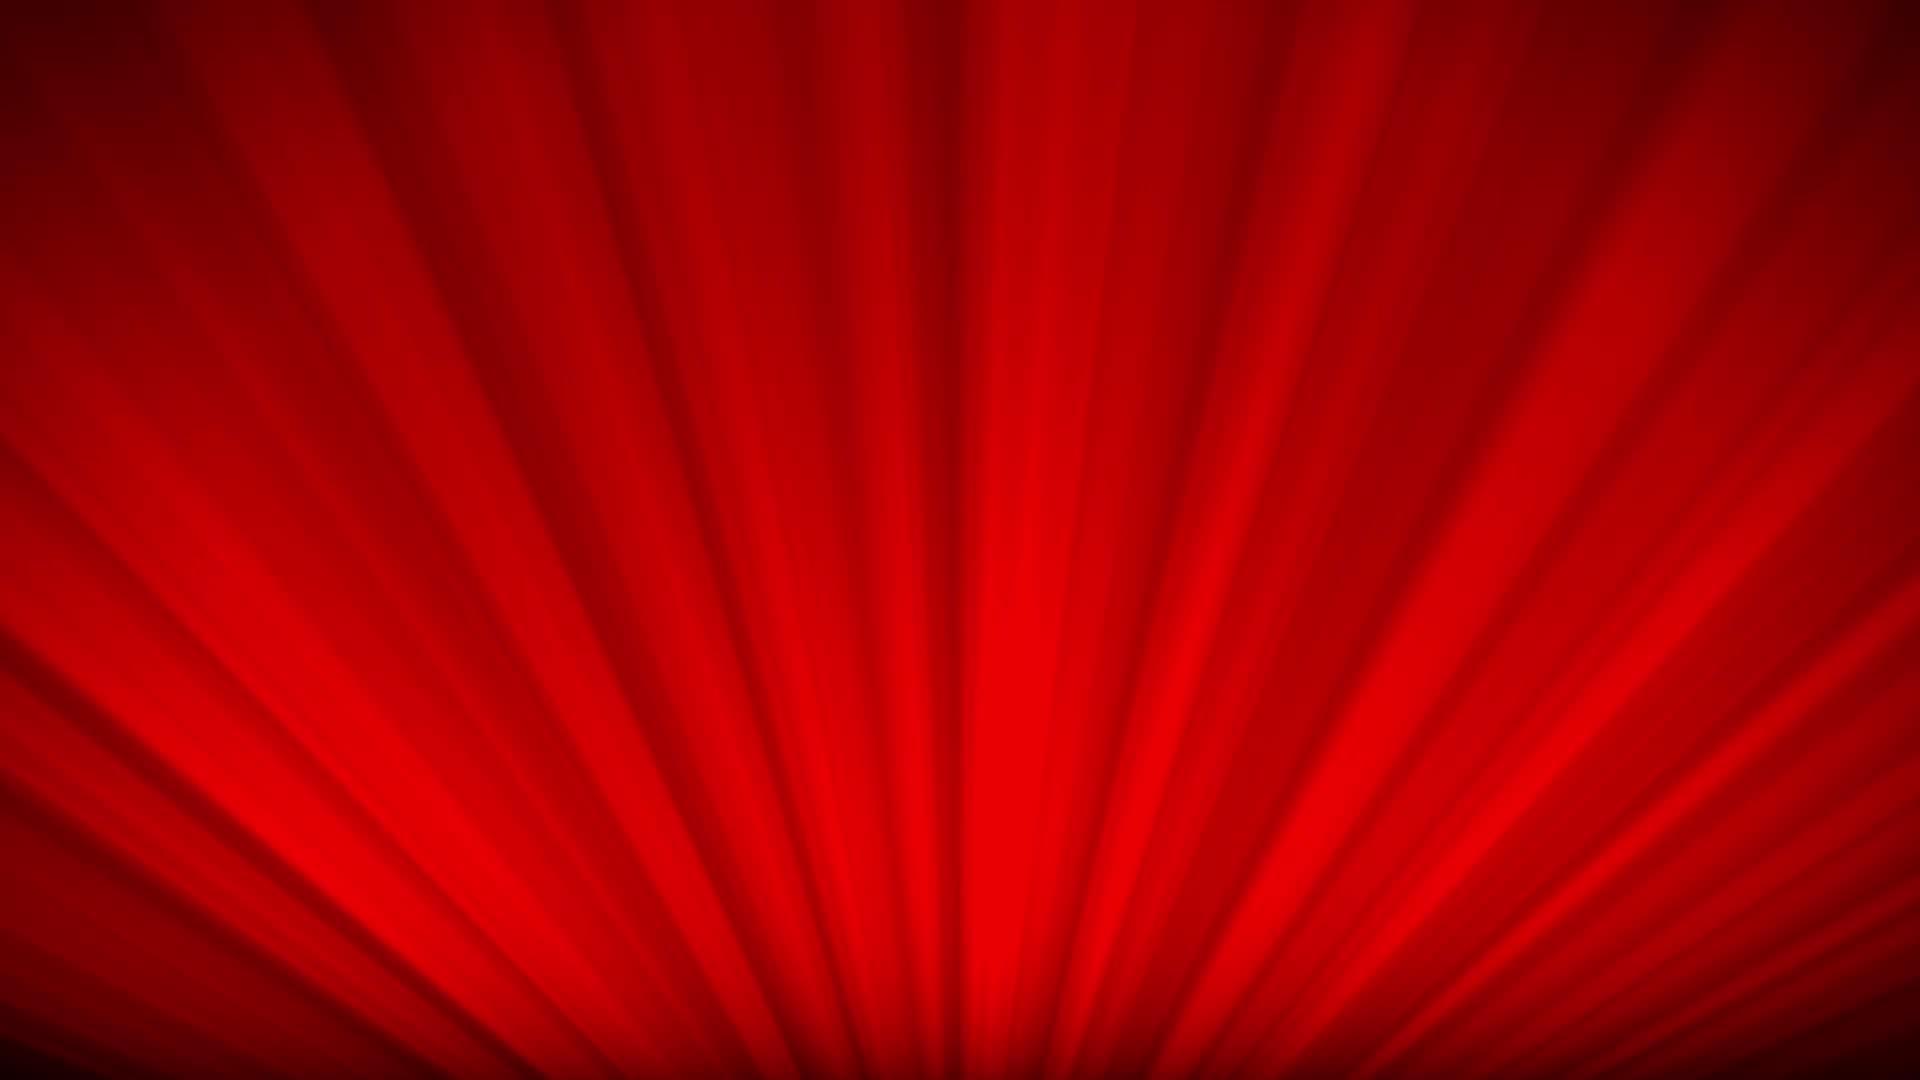 cool red backgrounds wallpapersafari